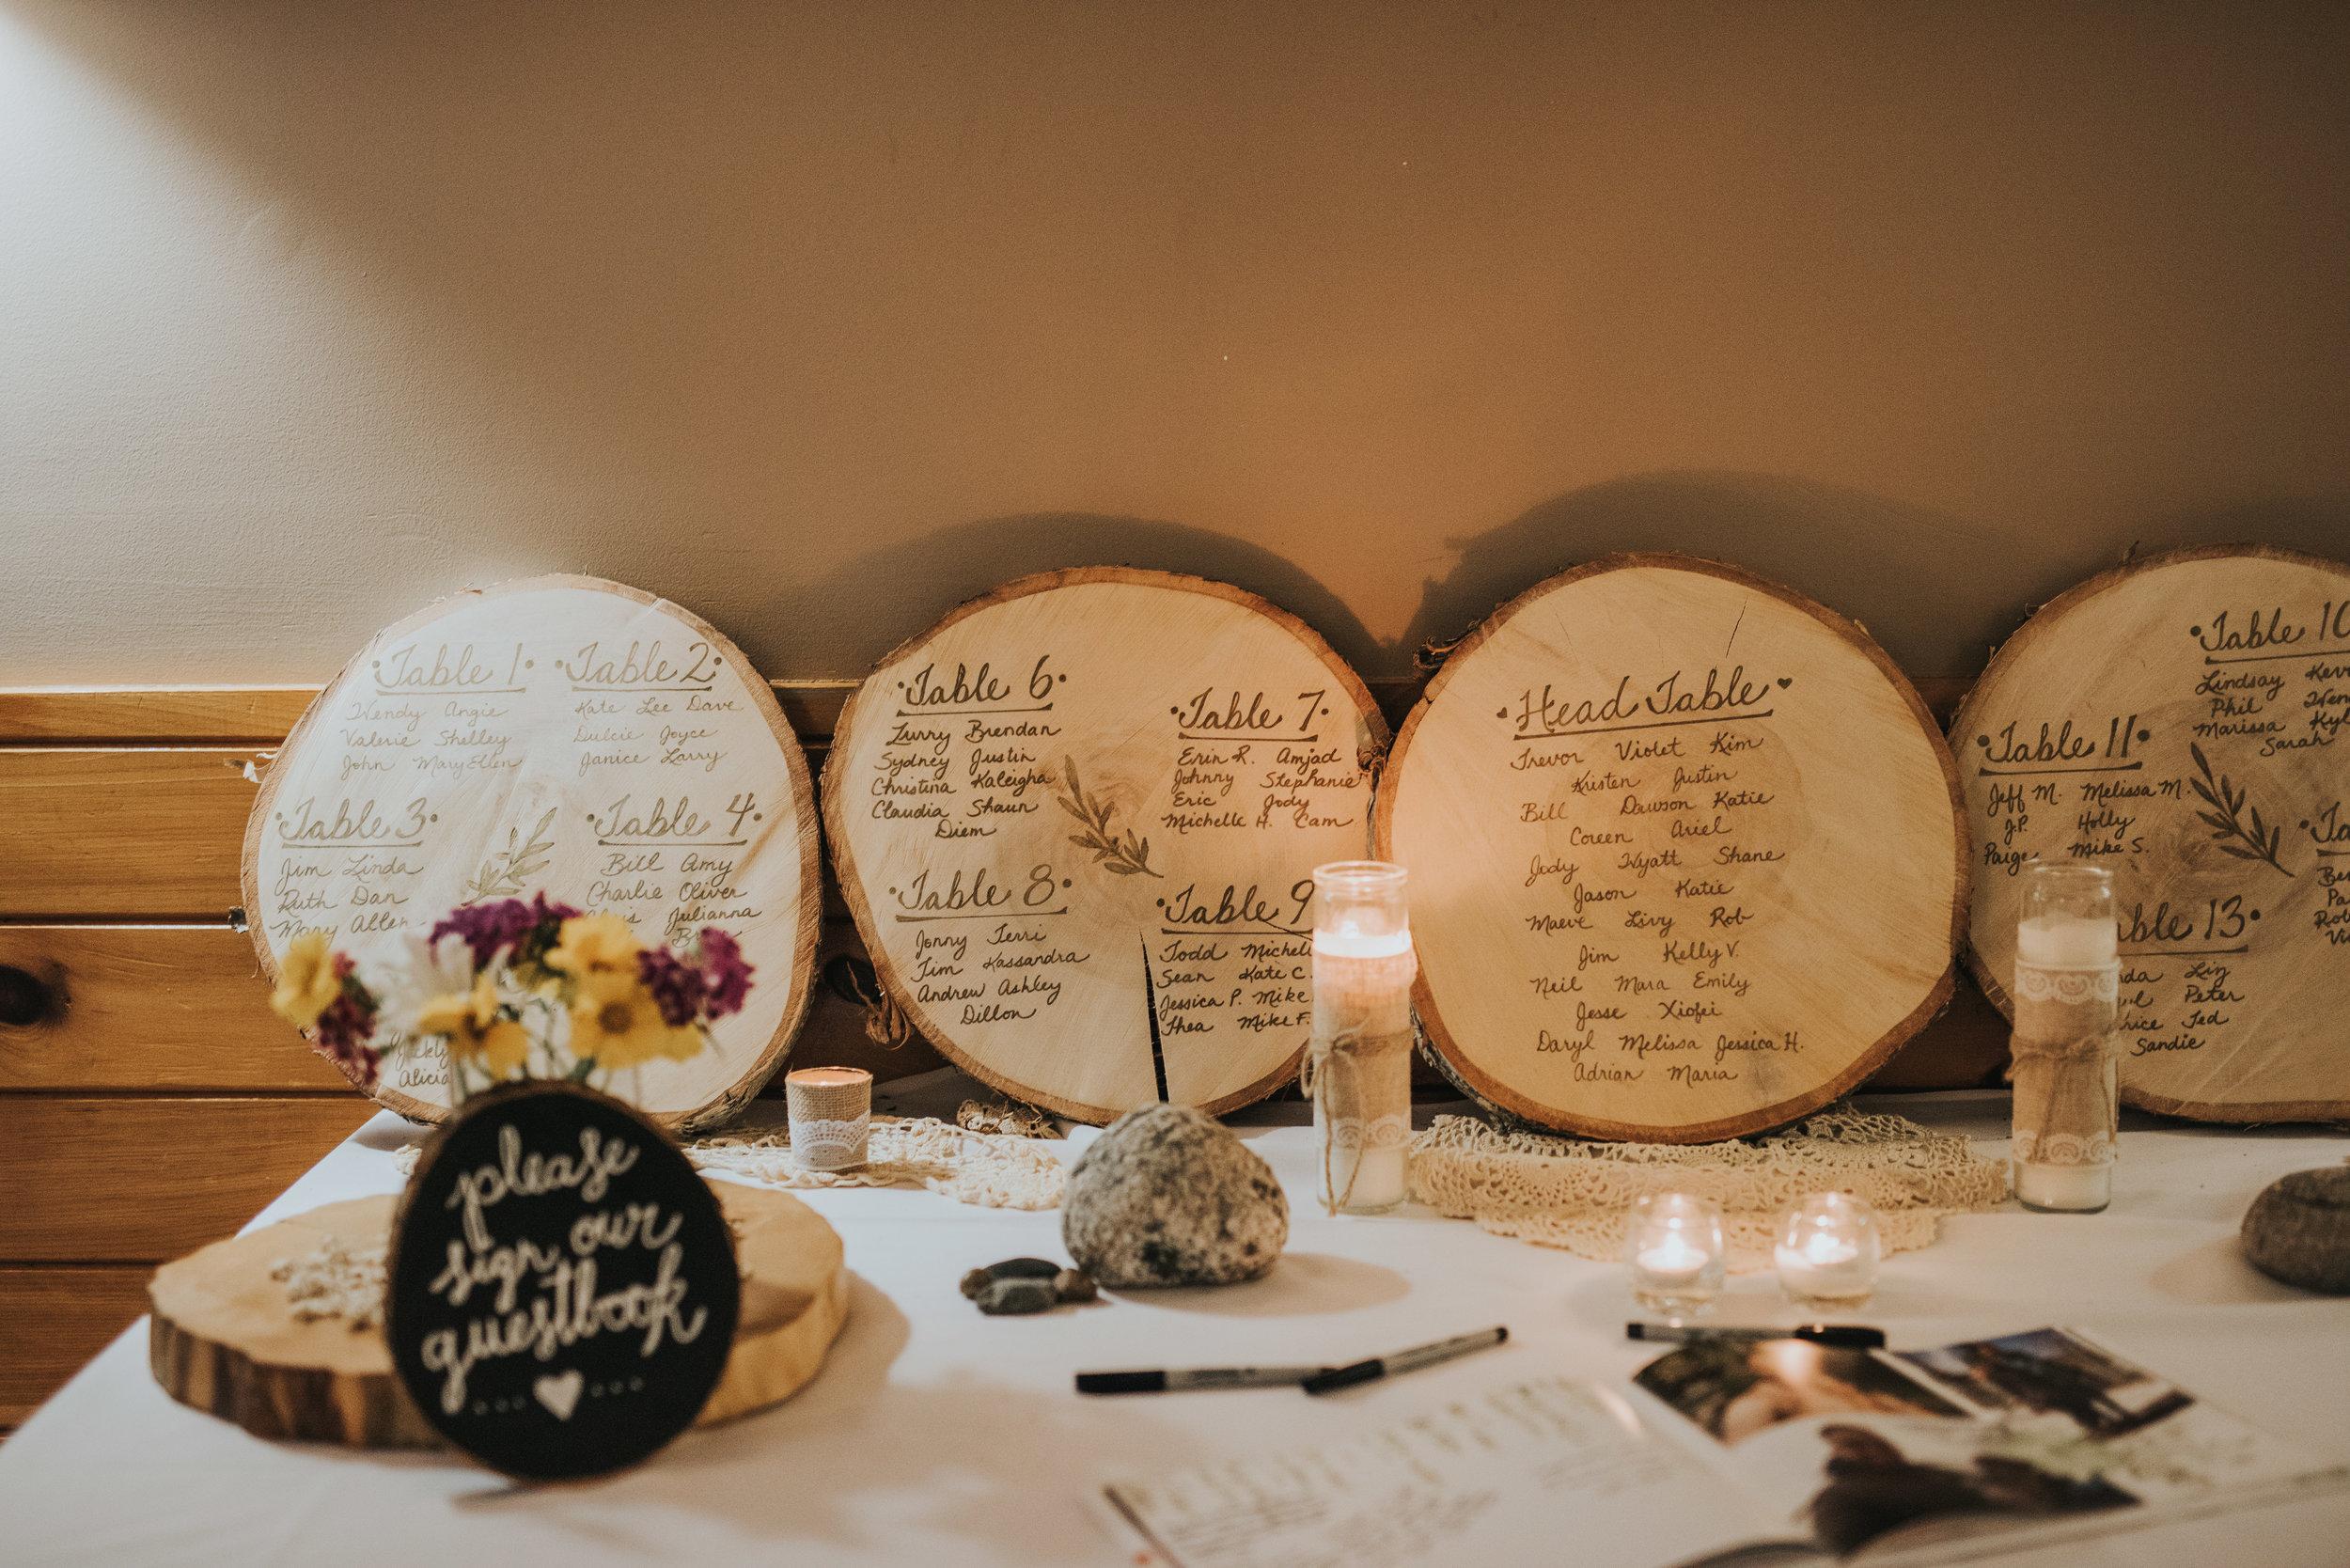 diy-table-settings-rustic-cabin-reception-toronto-bohemian-boho-outdoor-summer-wedding-documentary-wedding-photography-by-willow-birch-photo.jpg